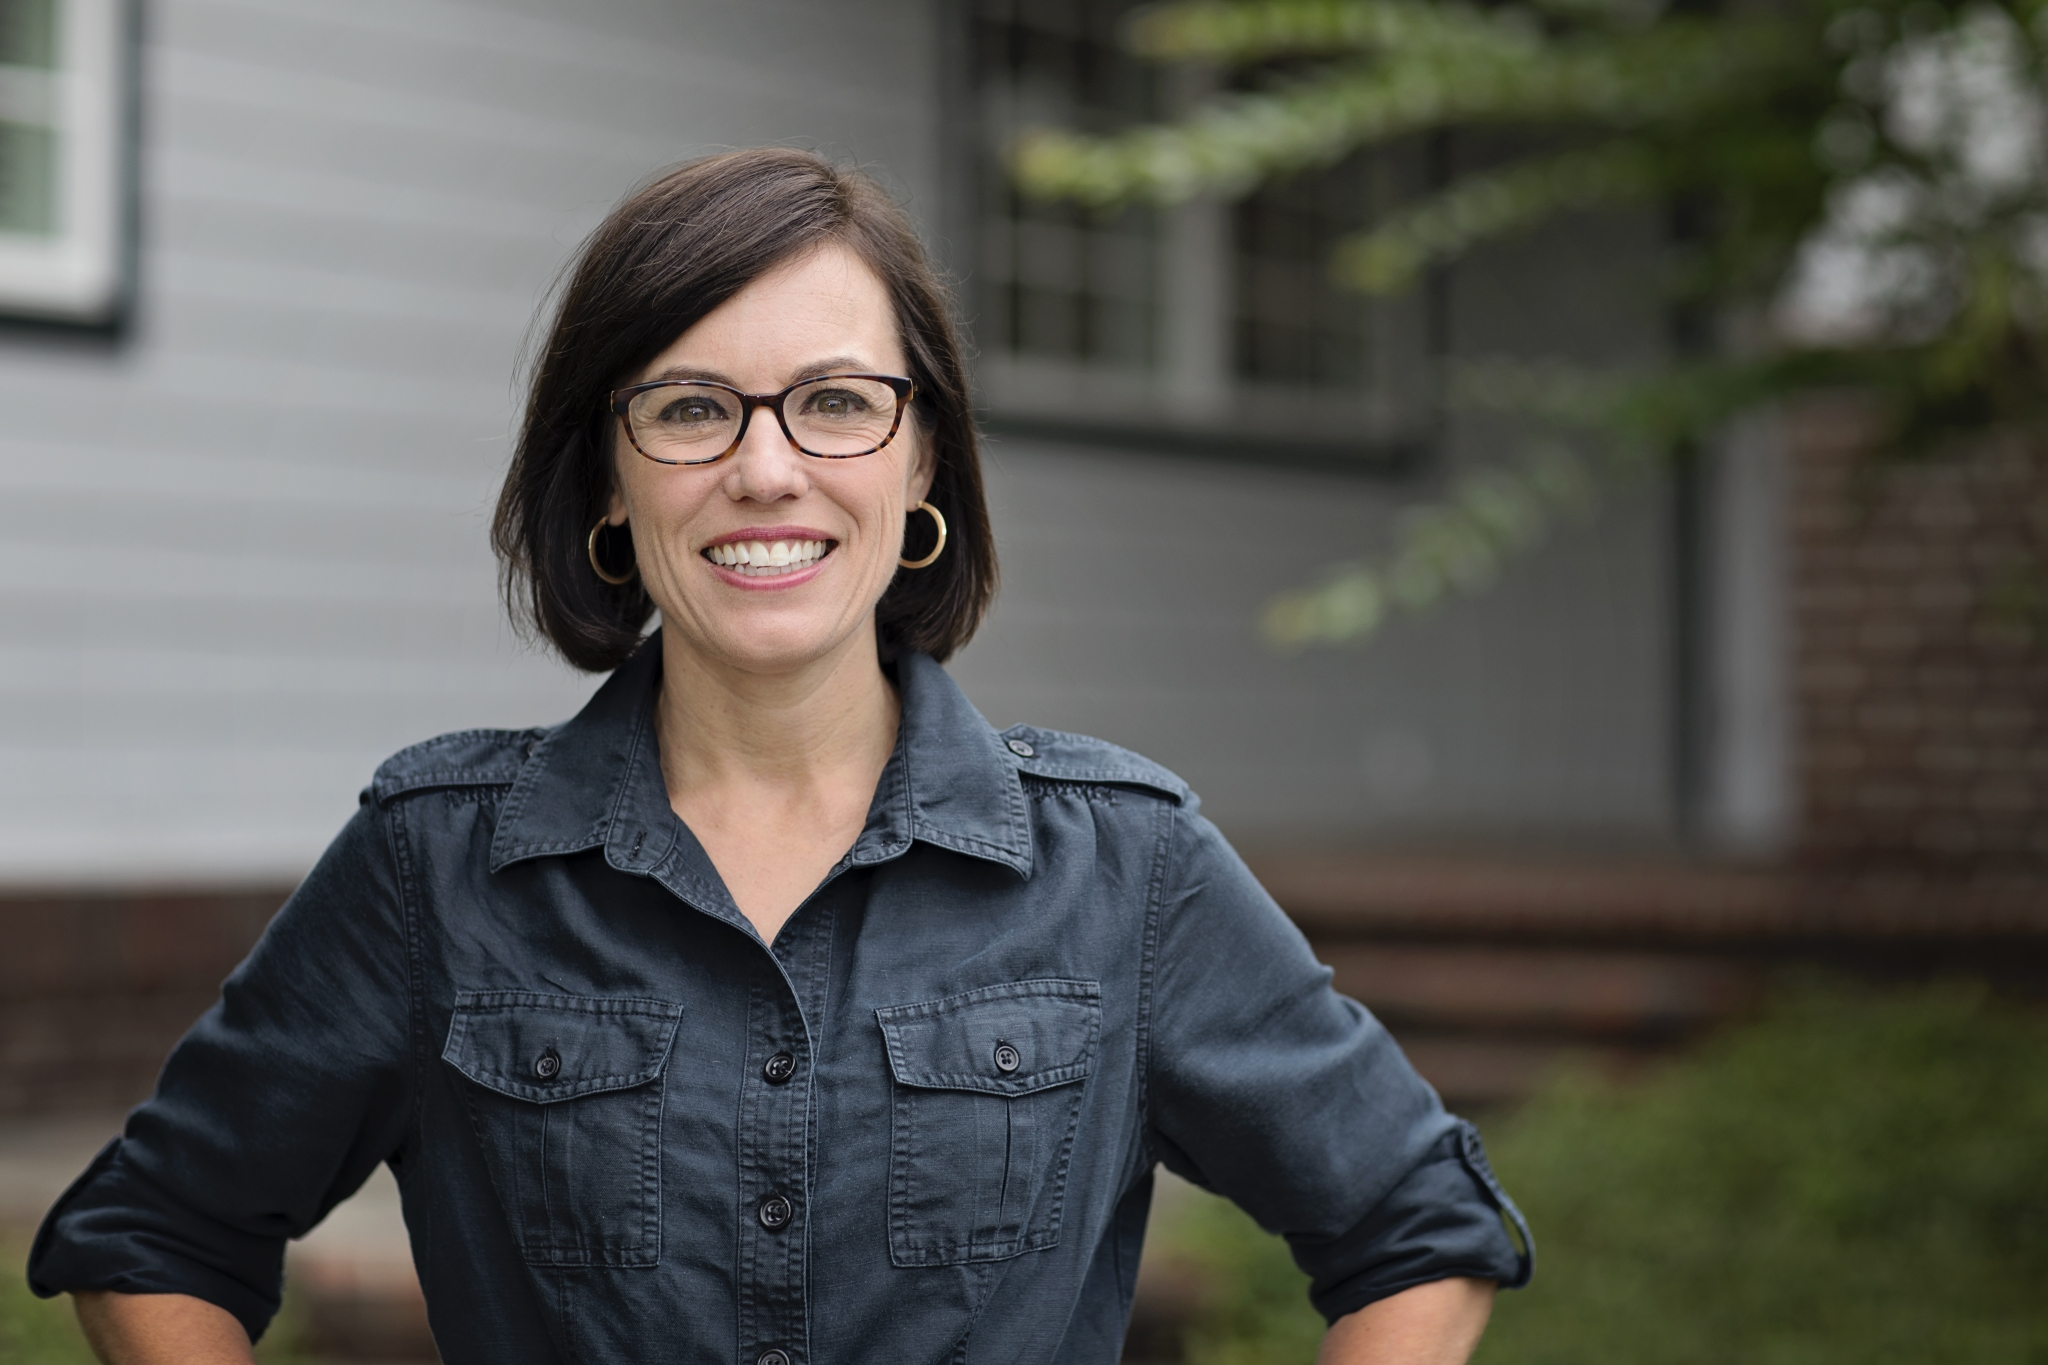 Heather B. Stallworth, AIA Principal